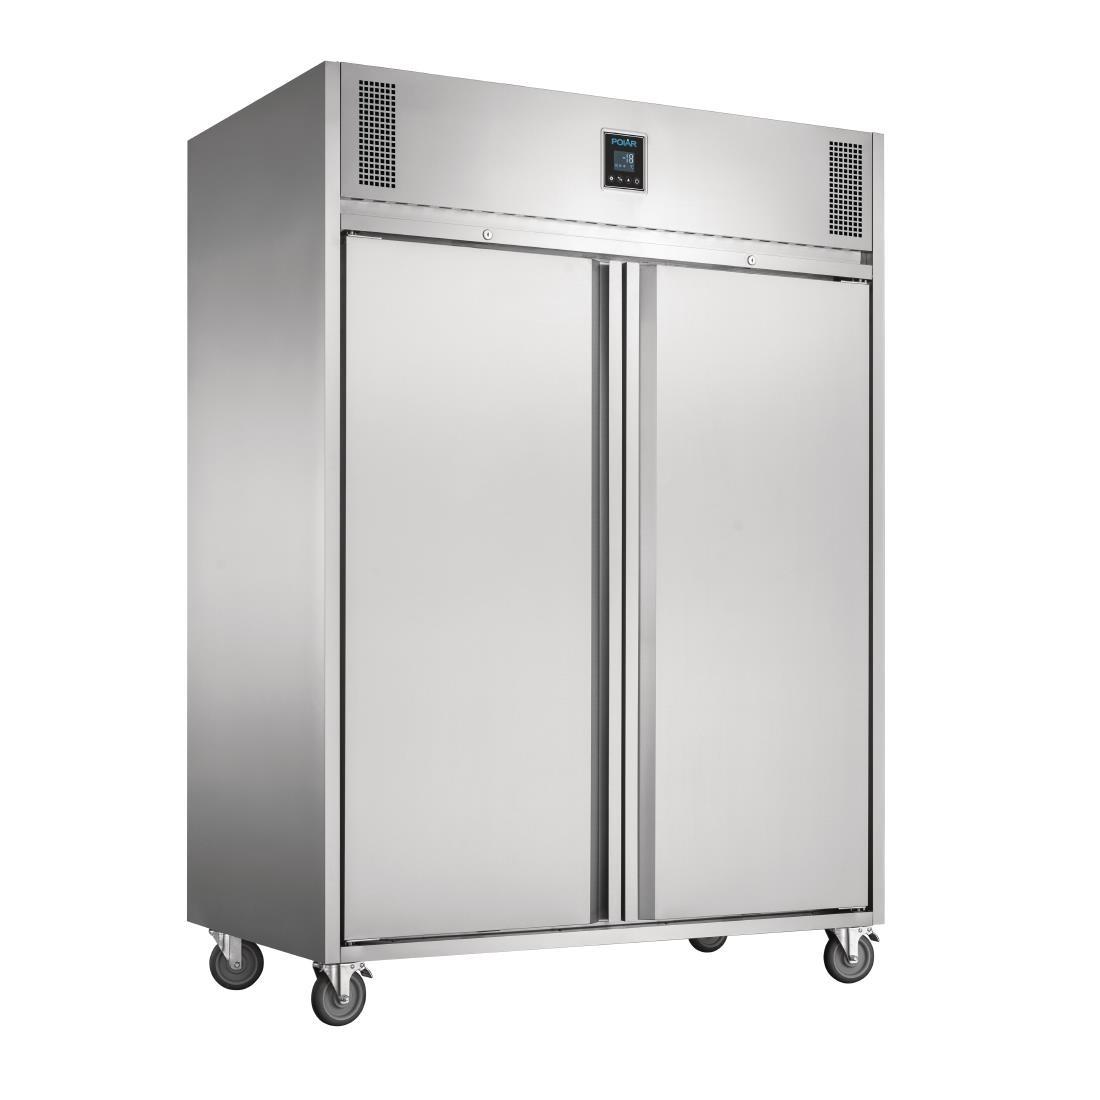 Polar UA004 U-Series Premium Double Door Freezer - W1400